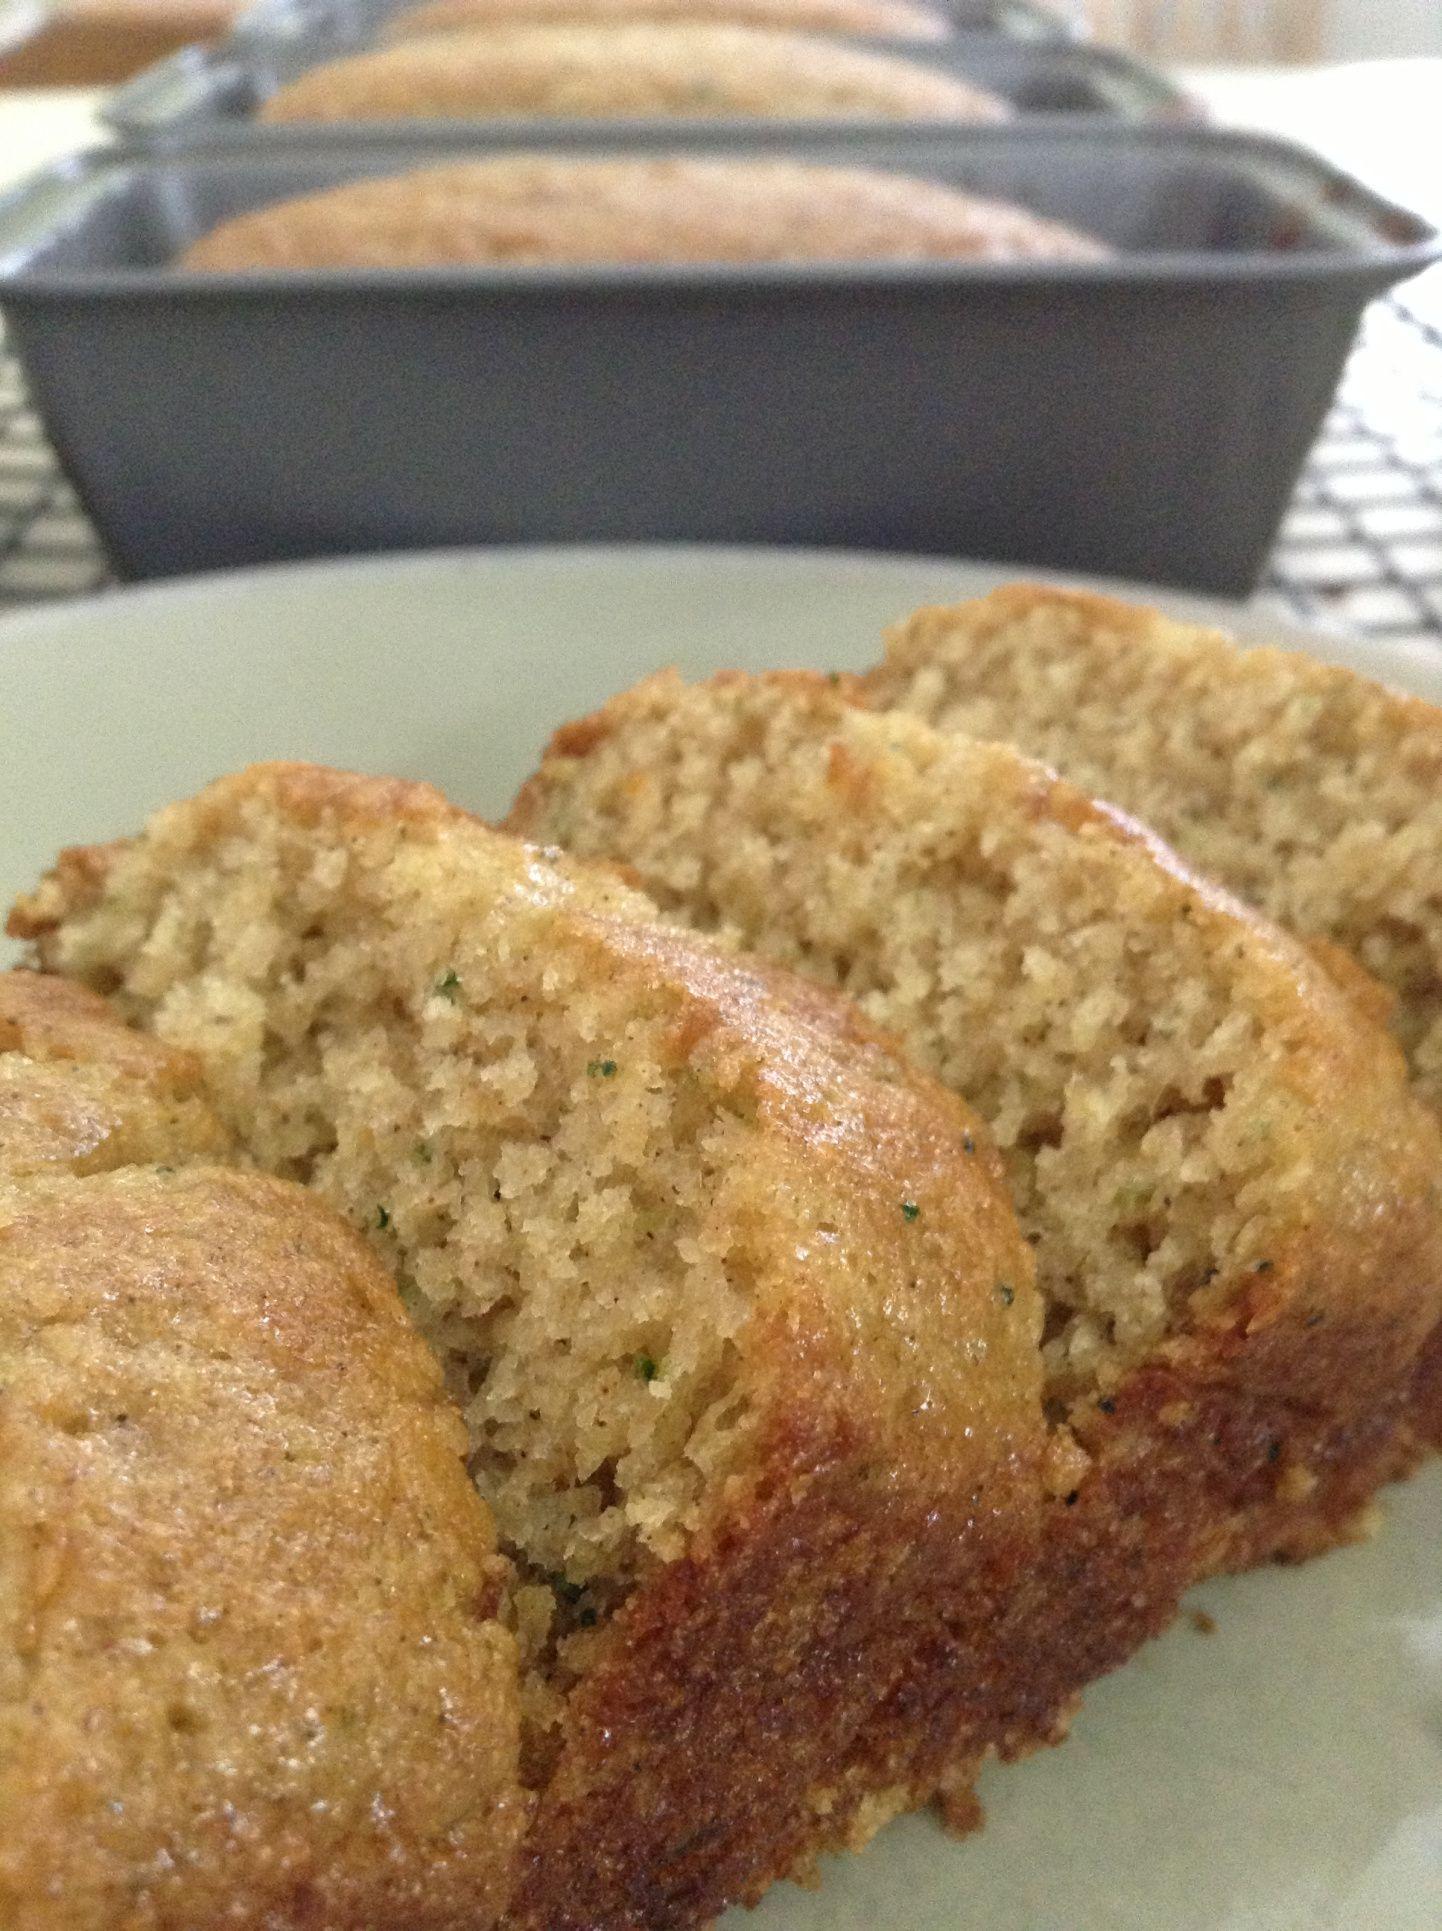 Blender Zucchini Bread Gluten Free Zucchini Gluten Free Zucchini Bread Wheat Free Bread Recipes